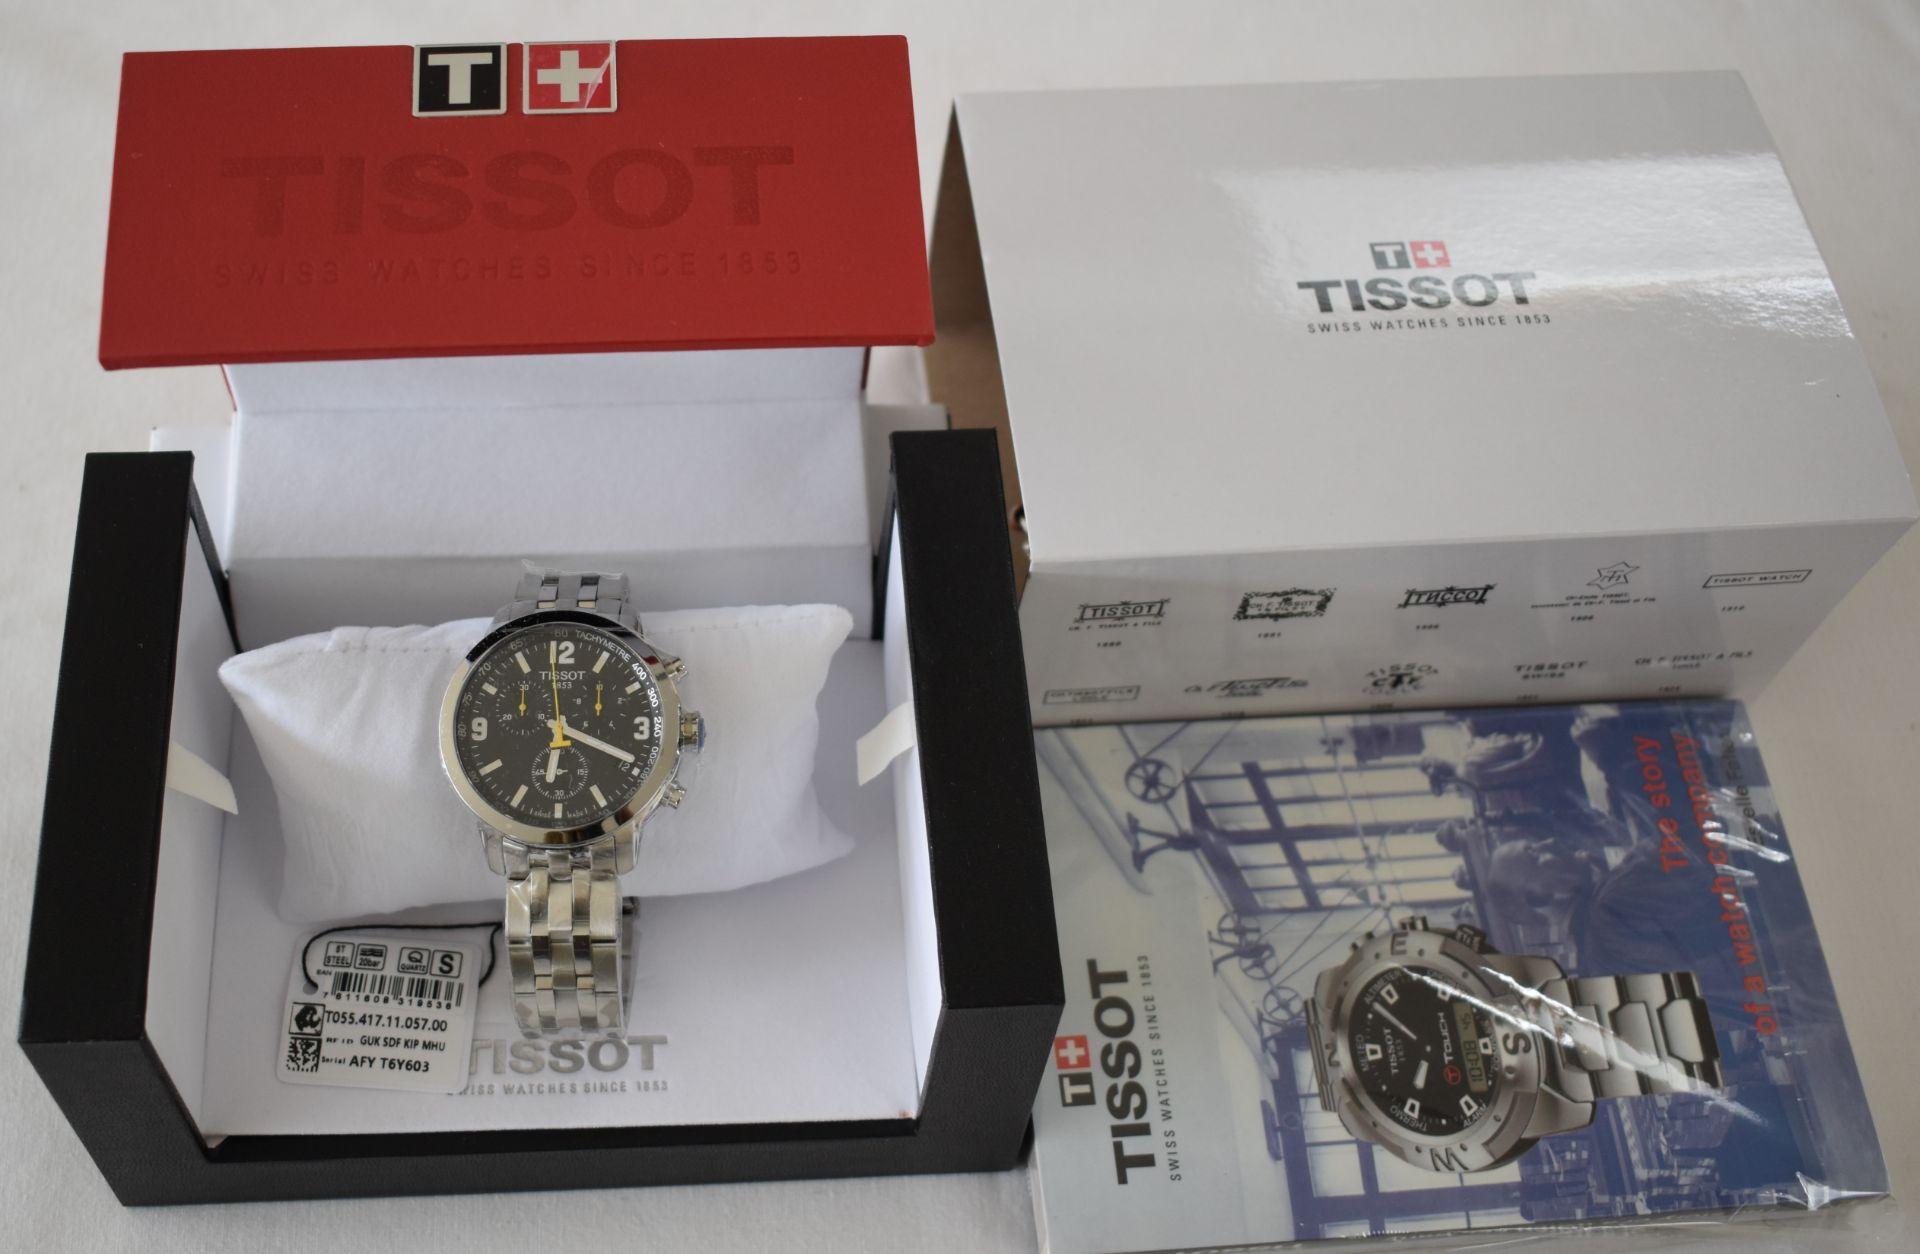 Tissot Men's Watch TO55.417.11.057.00 - Image 3 of 3